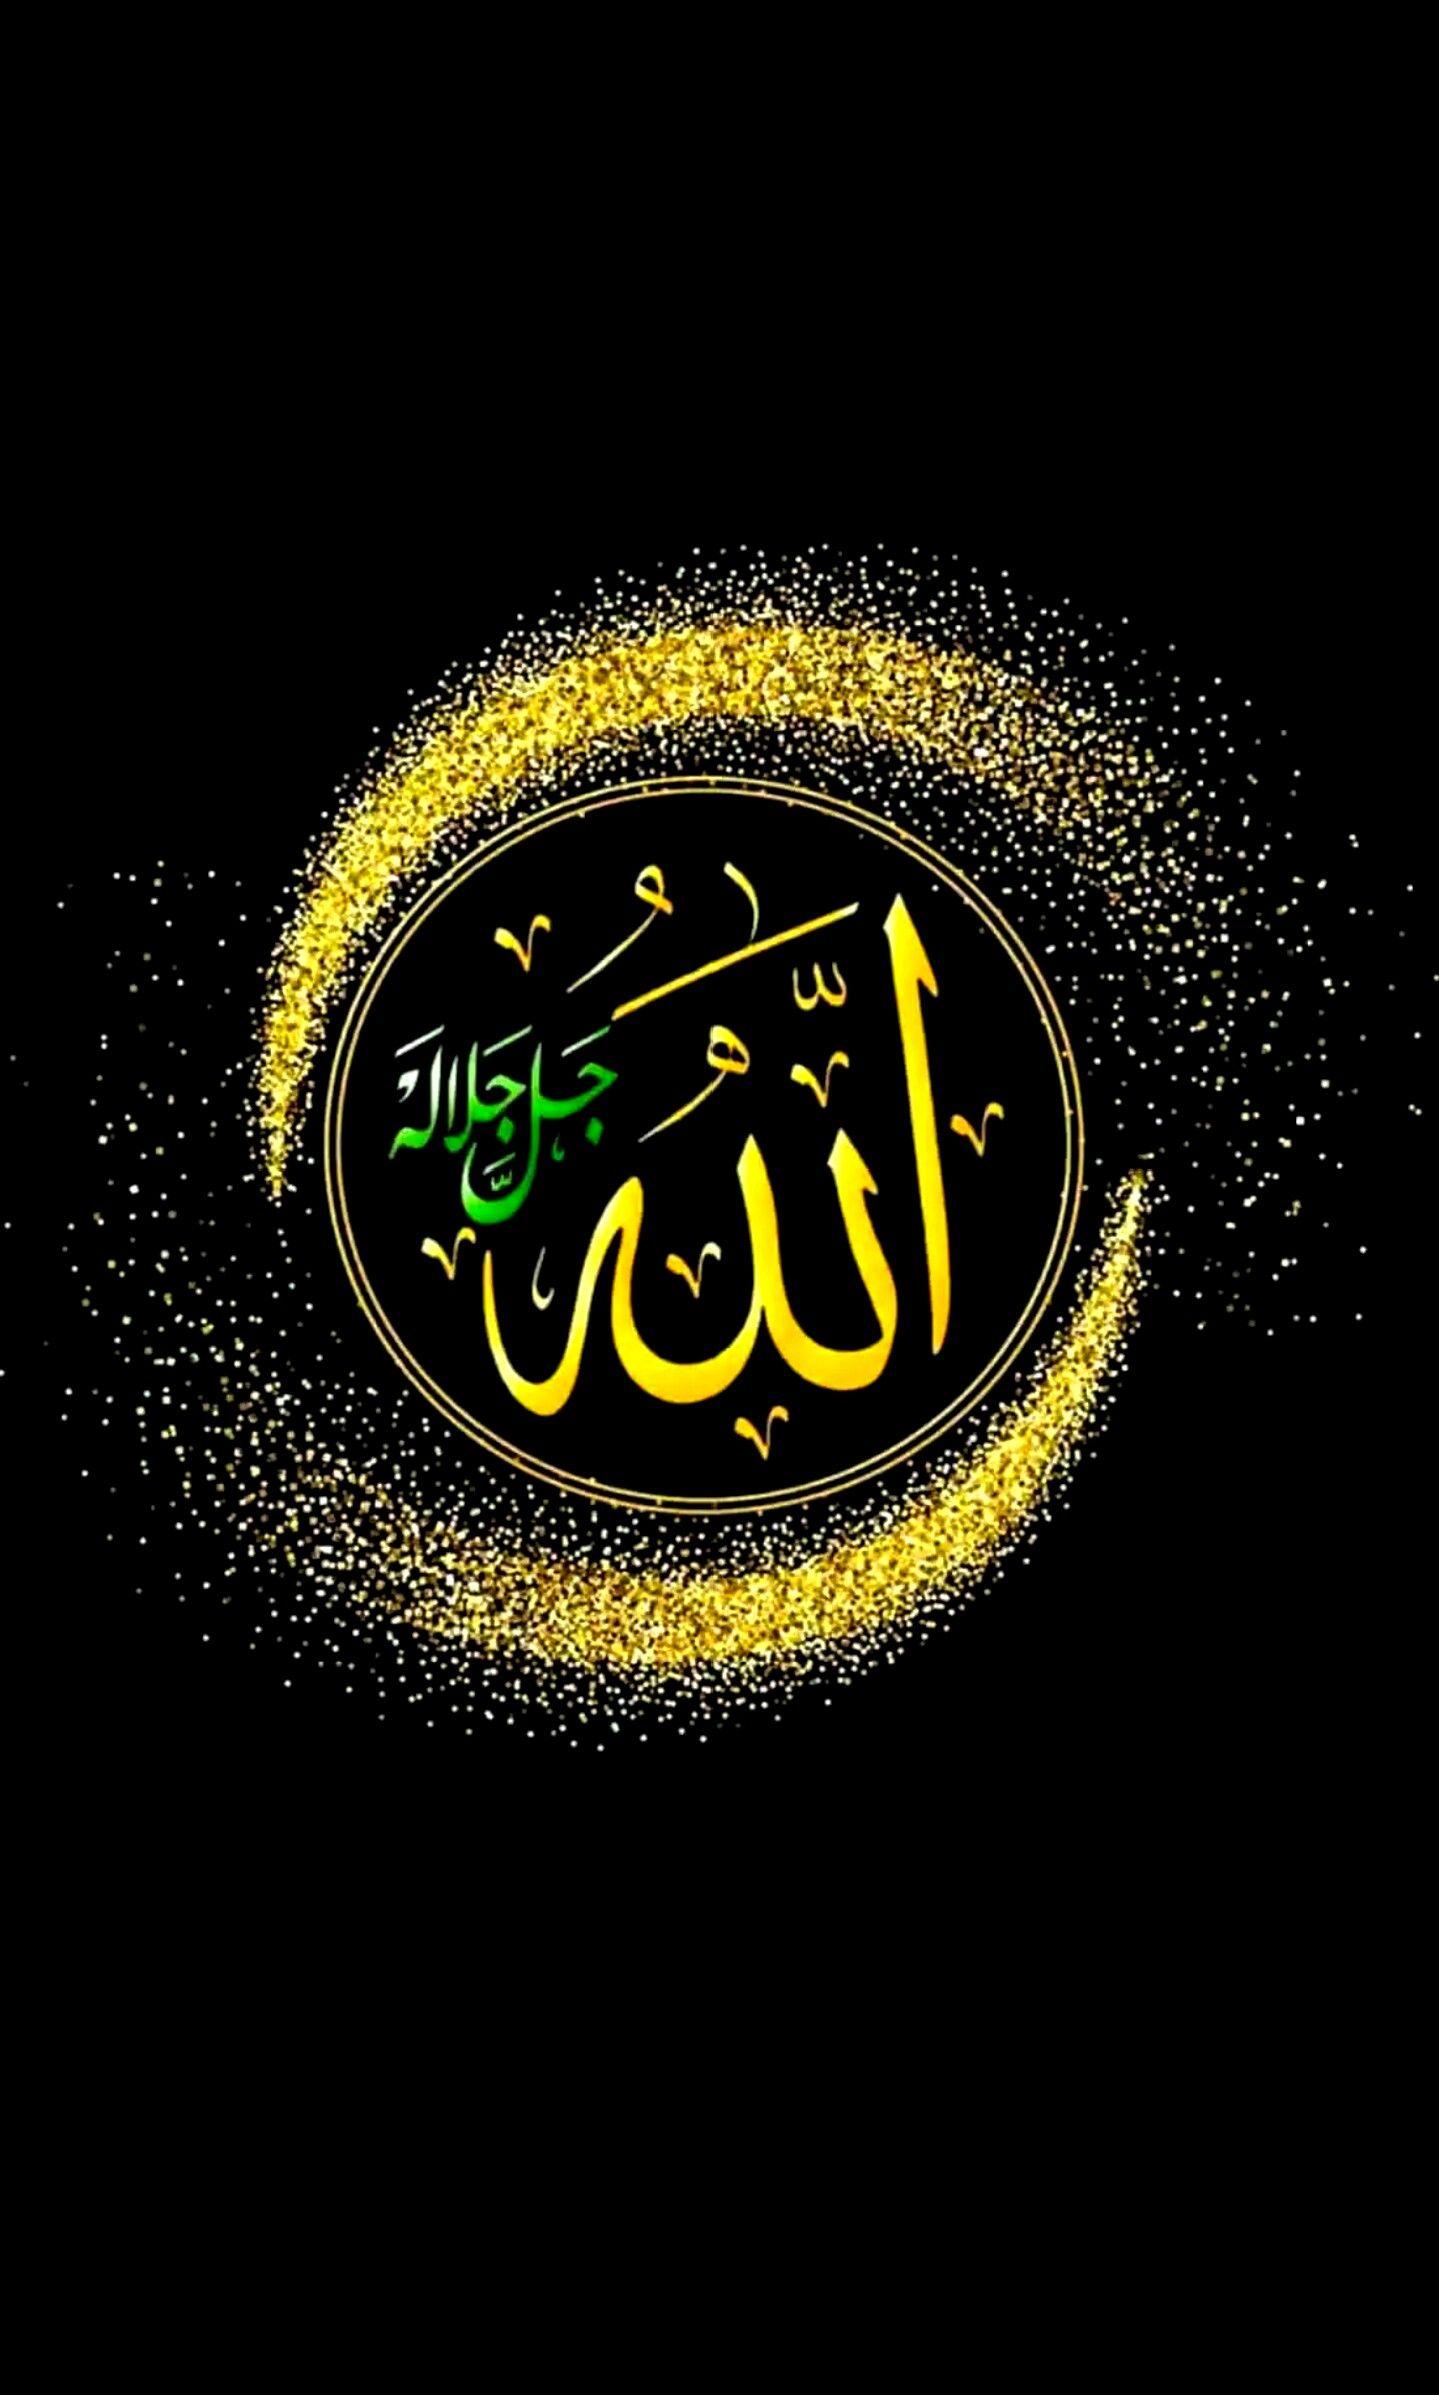 Pin Oleh Sudirman Di Kaligrafi Di 2020 Seni Islamis Seni Kaligrafi Seni